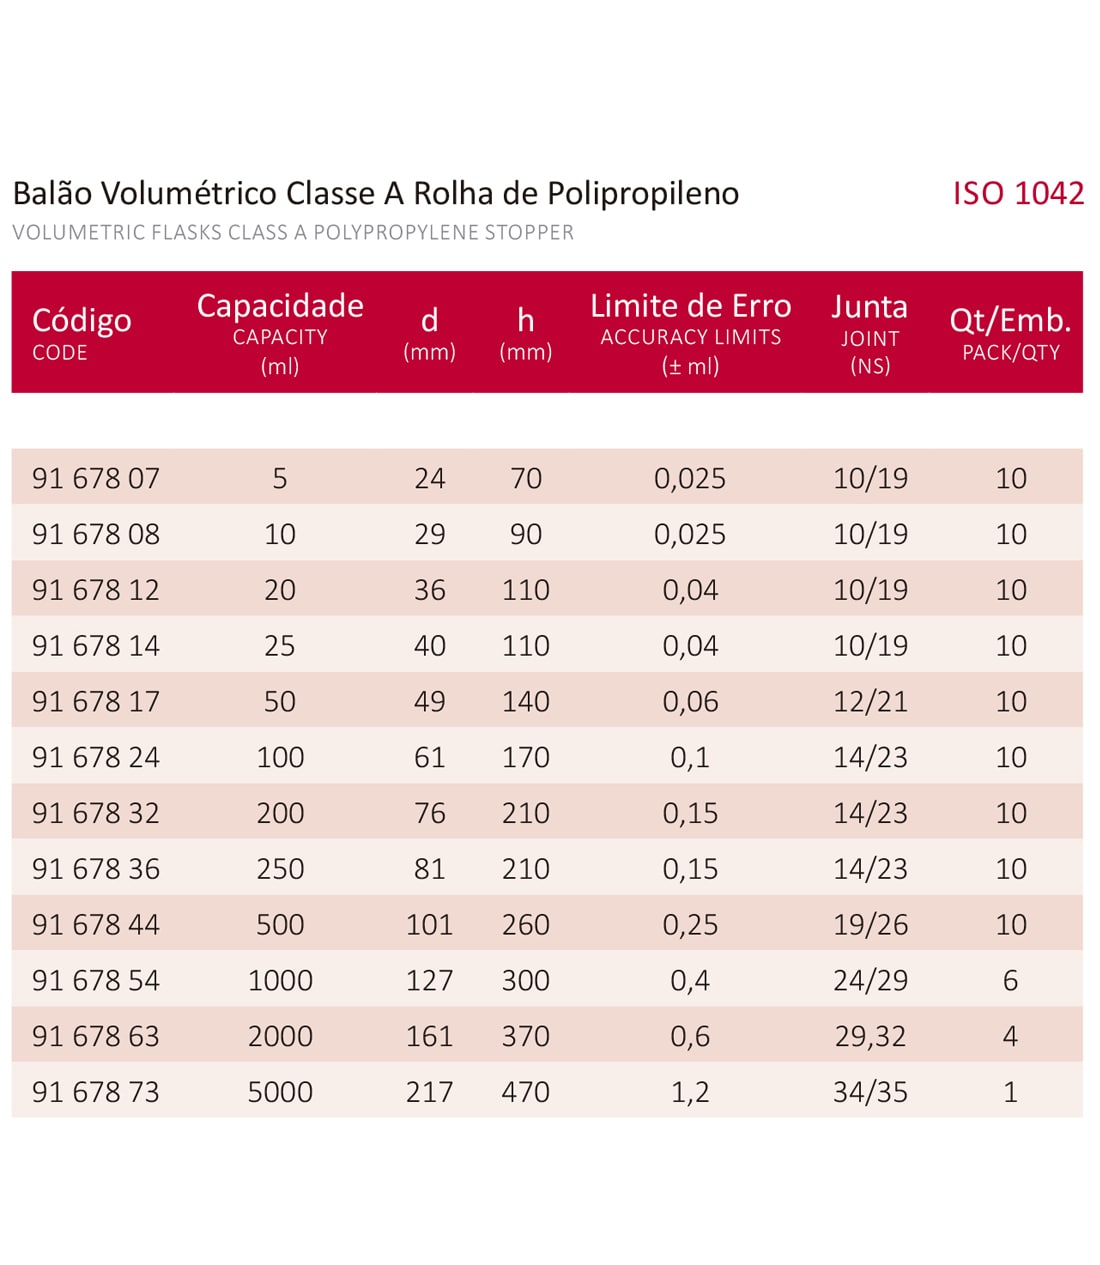 BALÃO VOLUMÉTRICO CLASSE A ROLHA POLI C/ CERTIFICADO RBC 500 ML - Marca Laborglas - Cód. 9167844-R